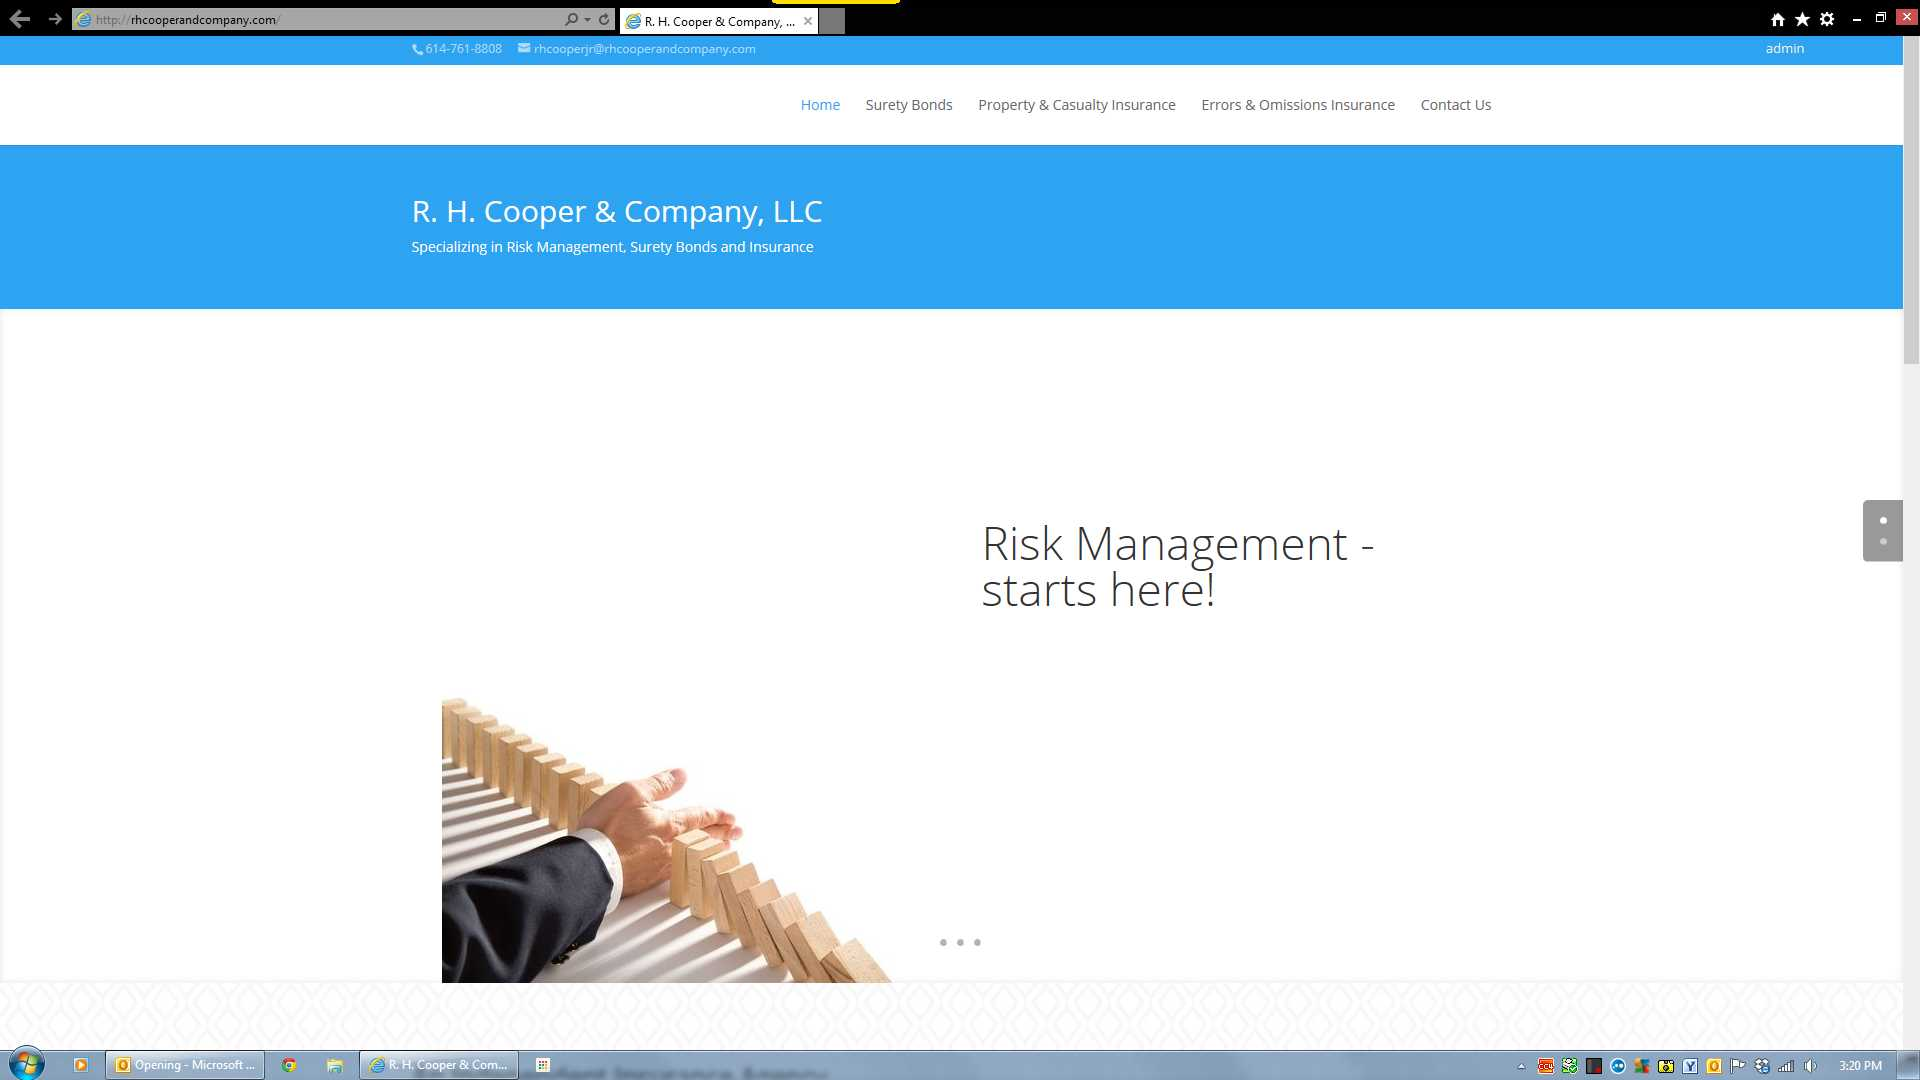 RHCooper and Company